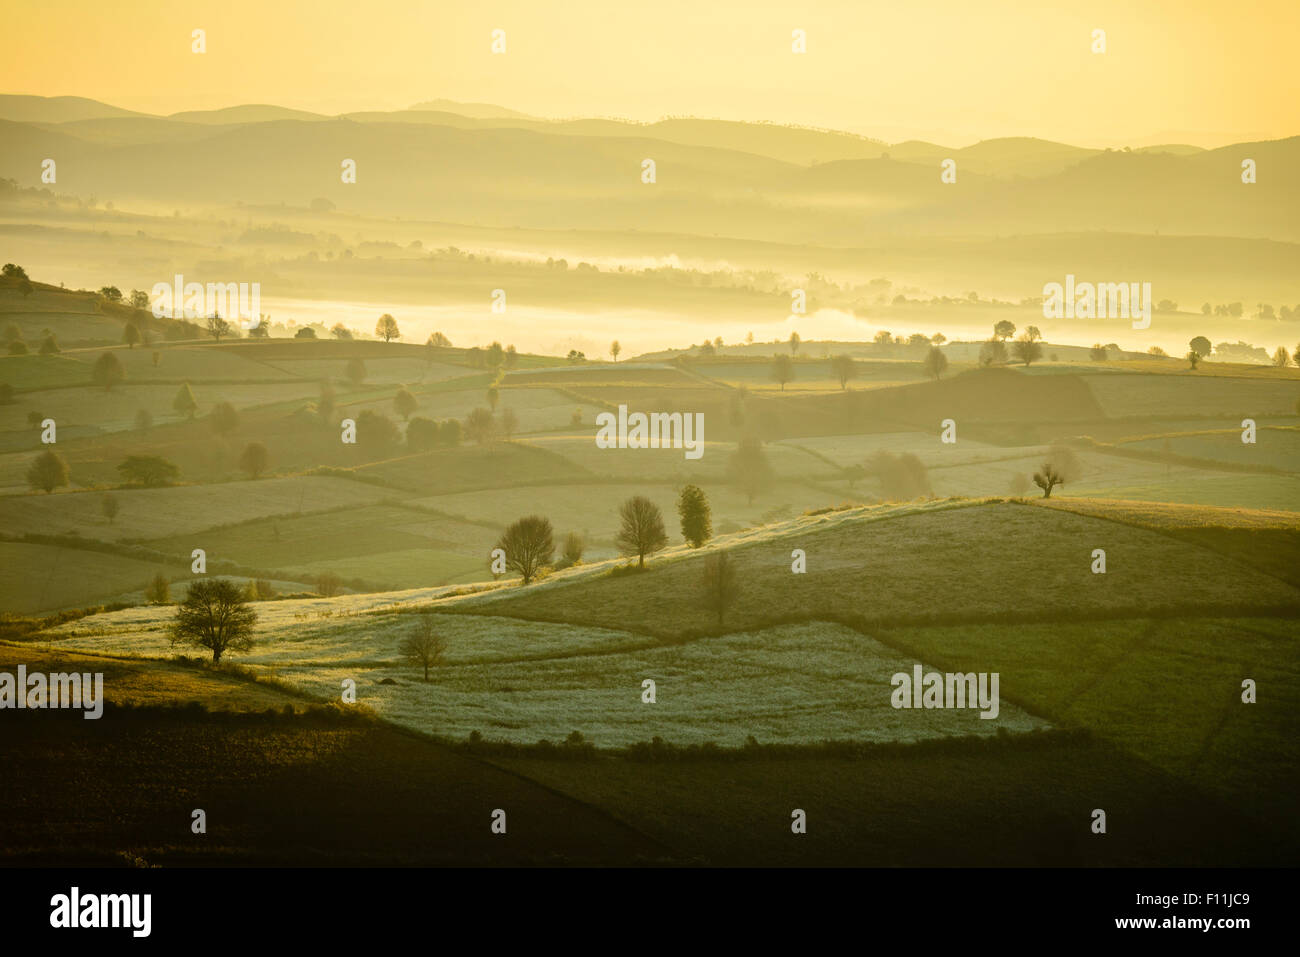 Vue aérienne de brouillard dans les terres agricoles rurales, Mandalay, Myanmar Photo Stock